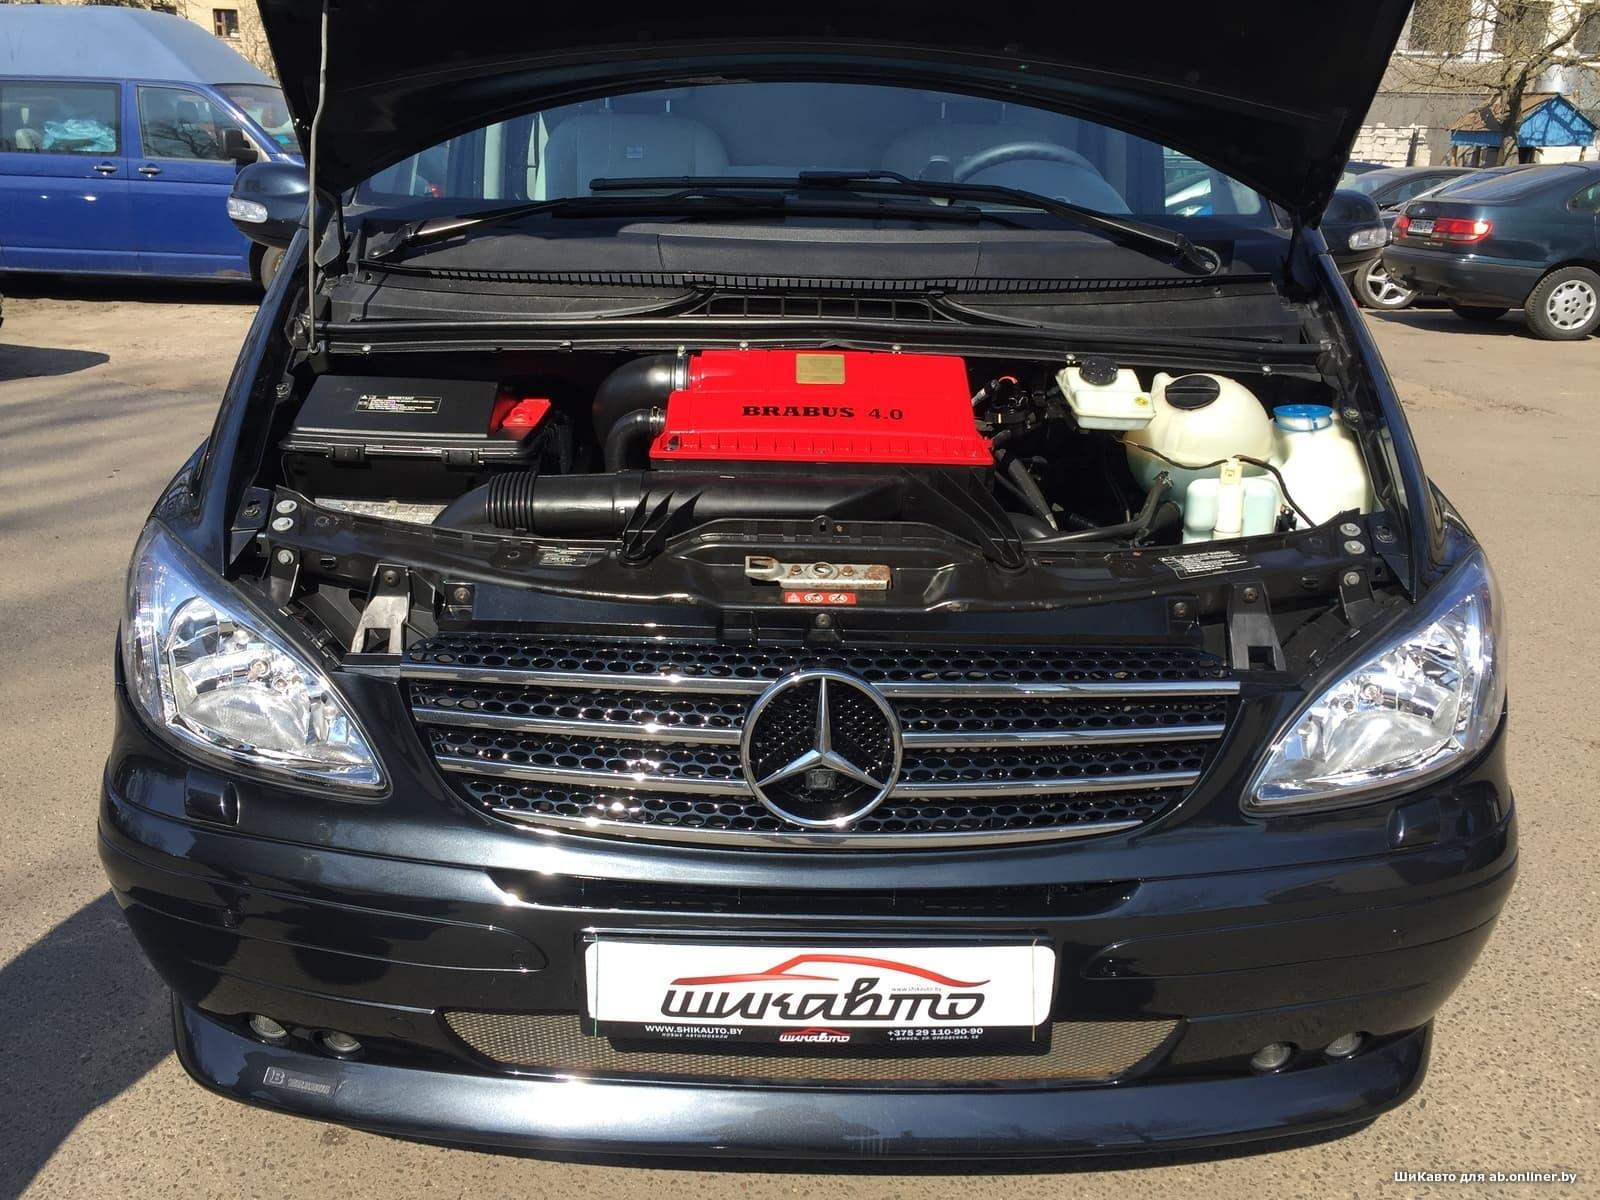 Mercedes-Benz Viano BRABUS 4.0